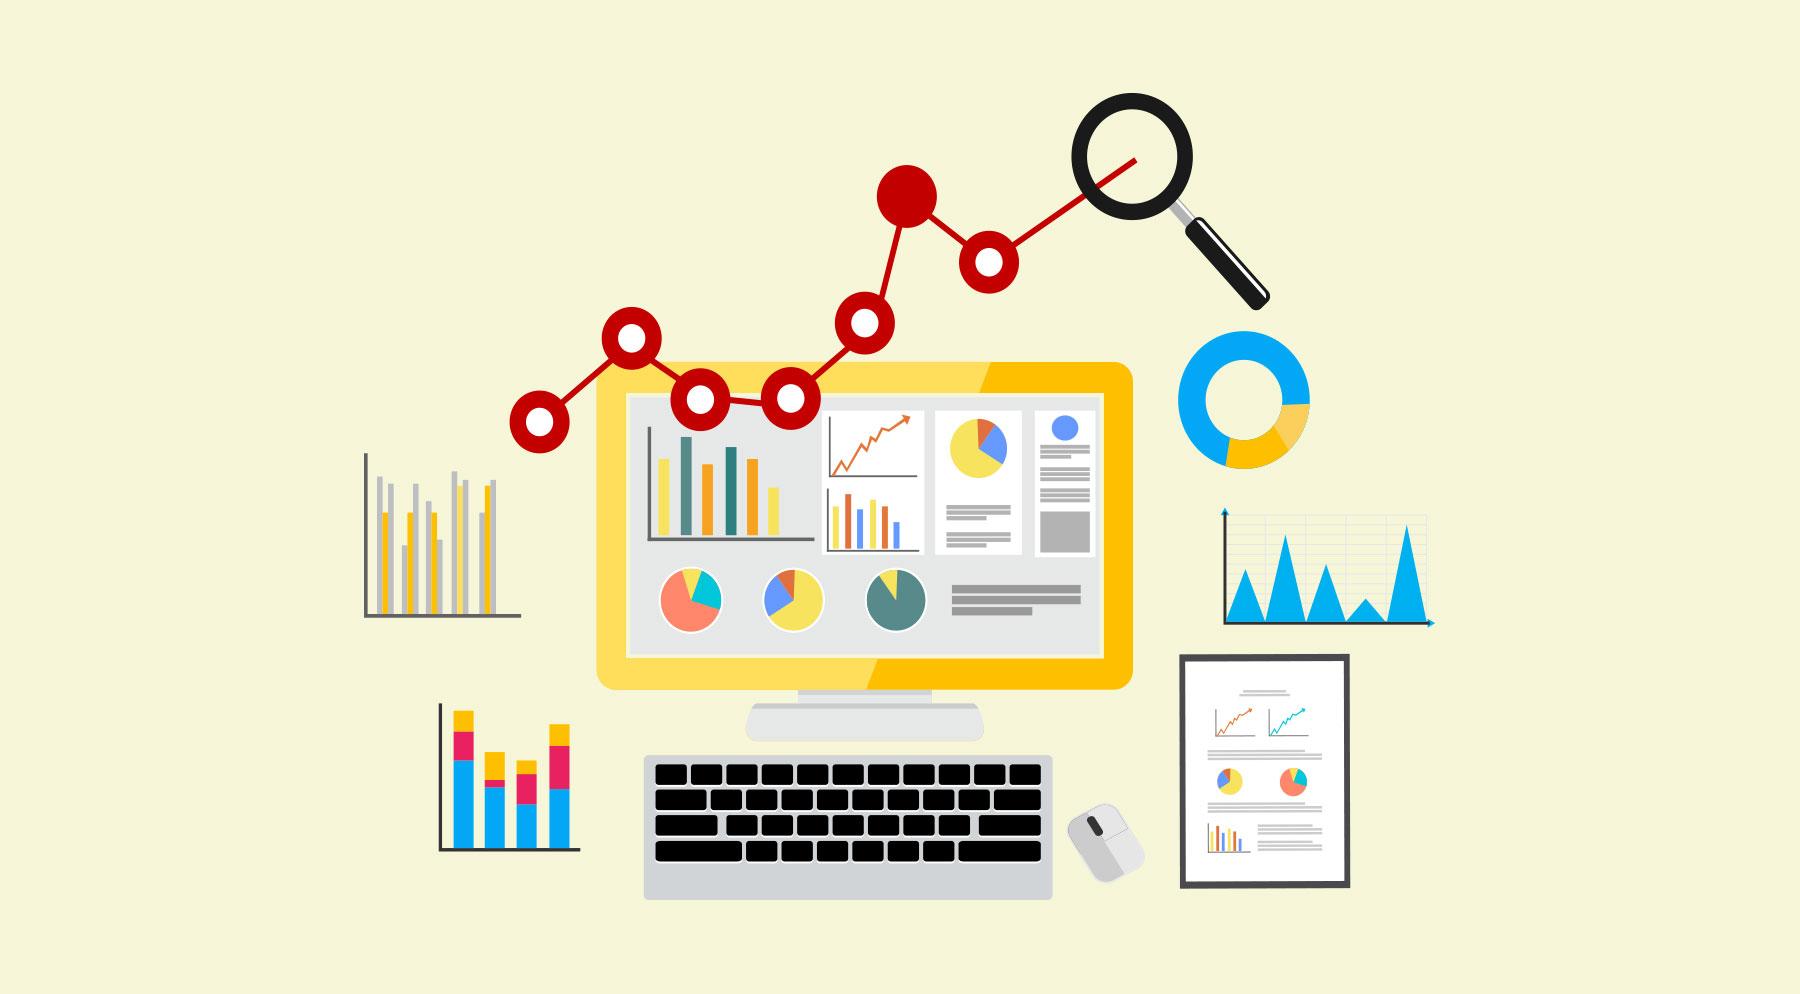 The Arnold Clark Digital Marketing Scholarship Fund